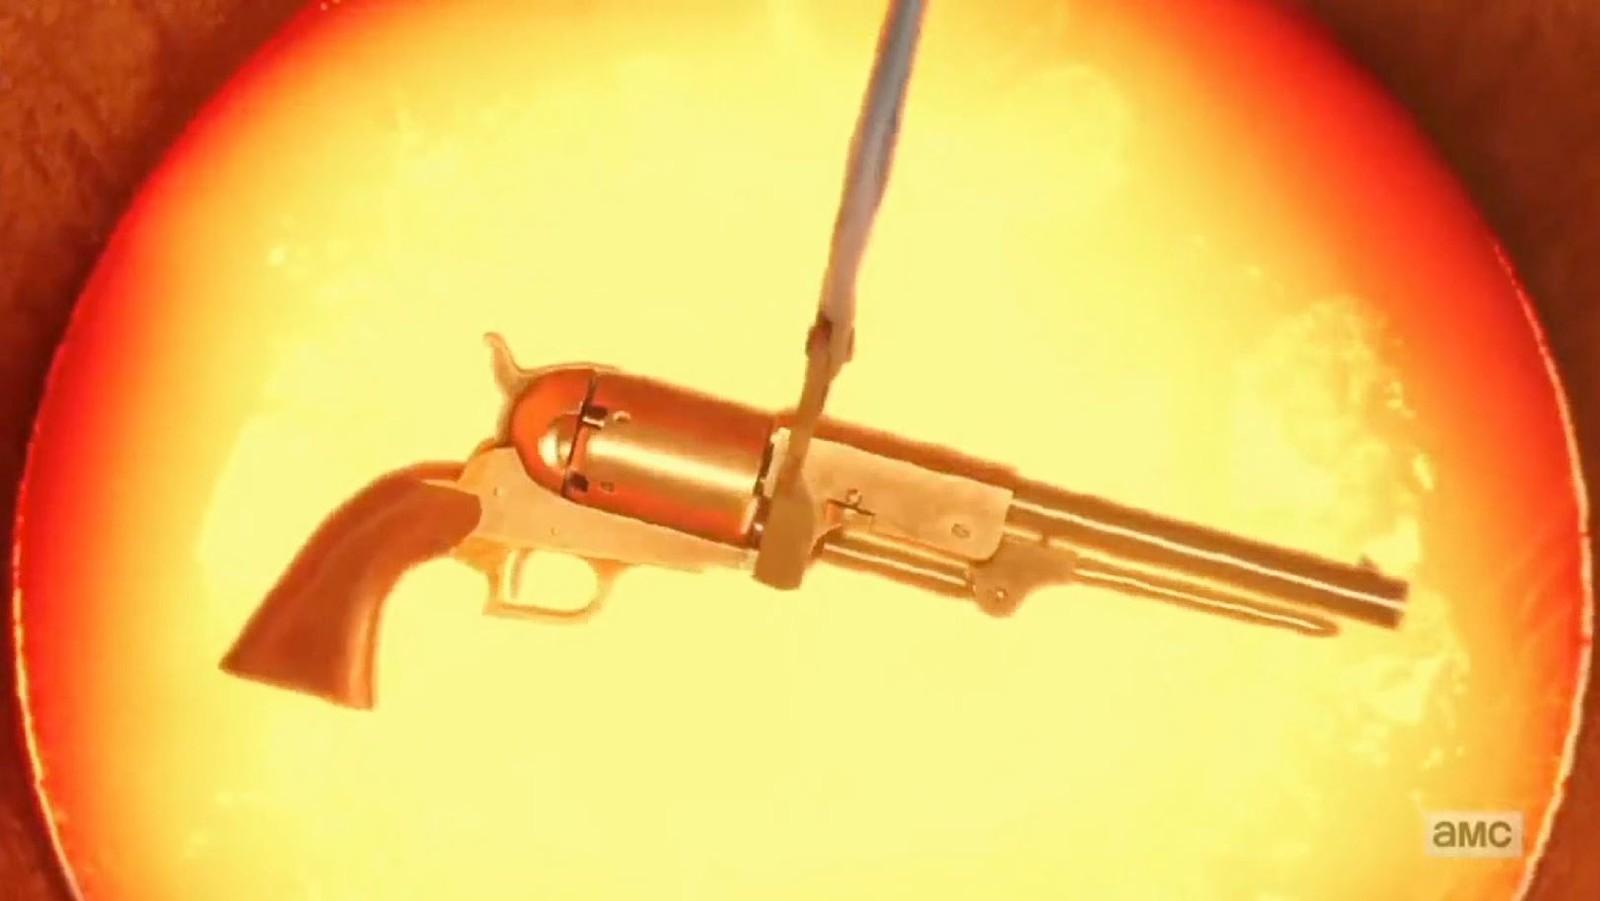 Saint of Killers revolver.